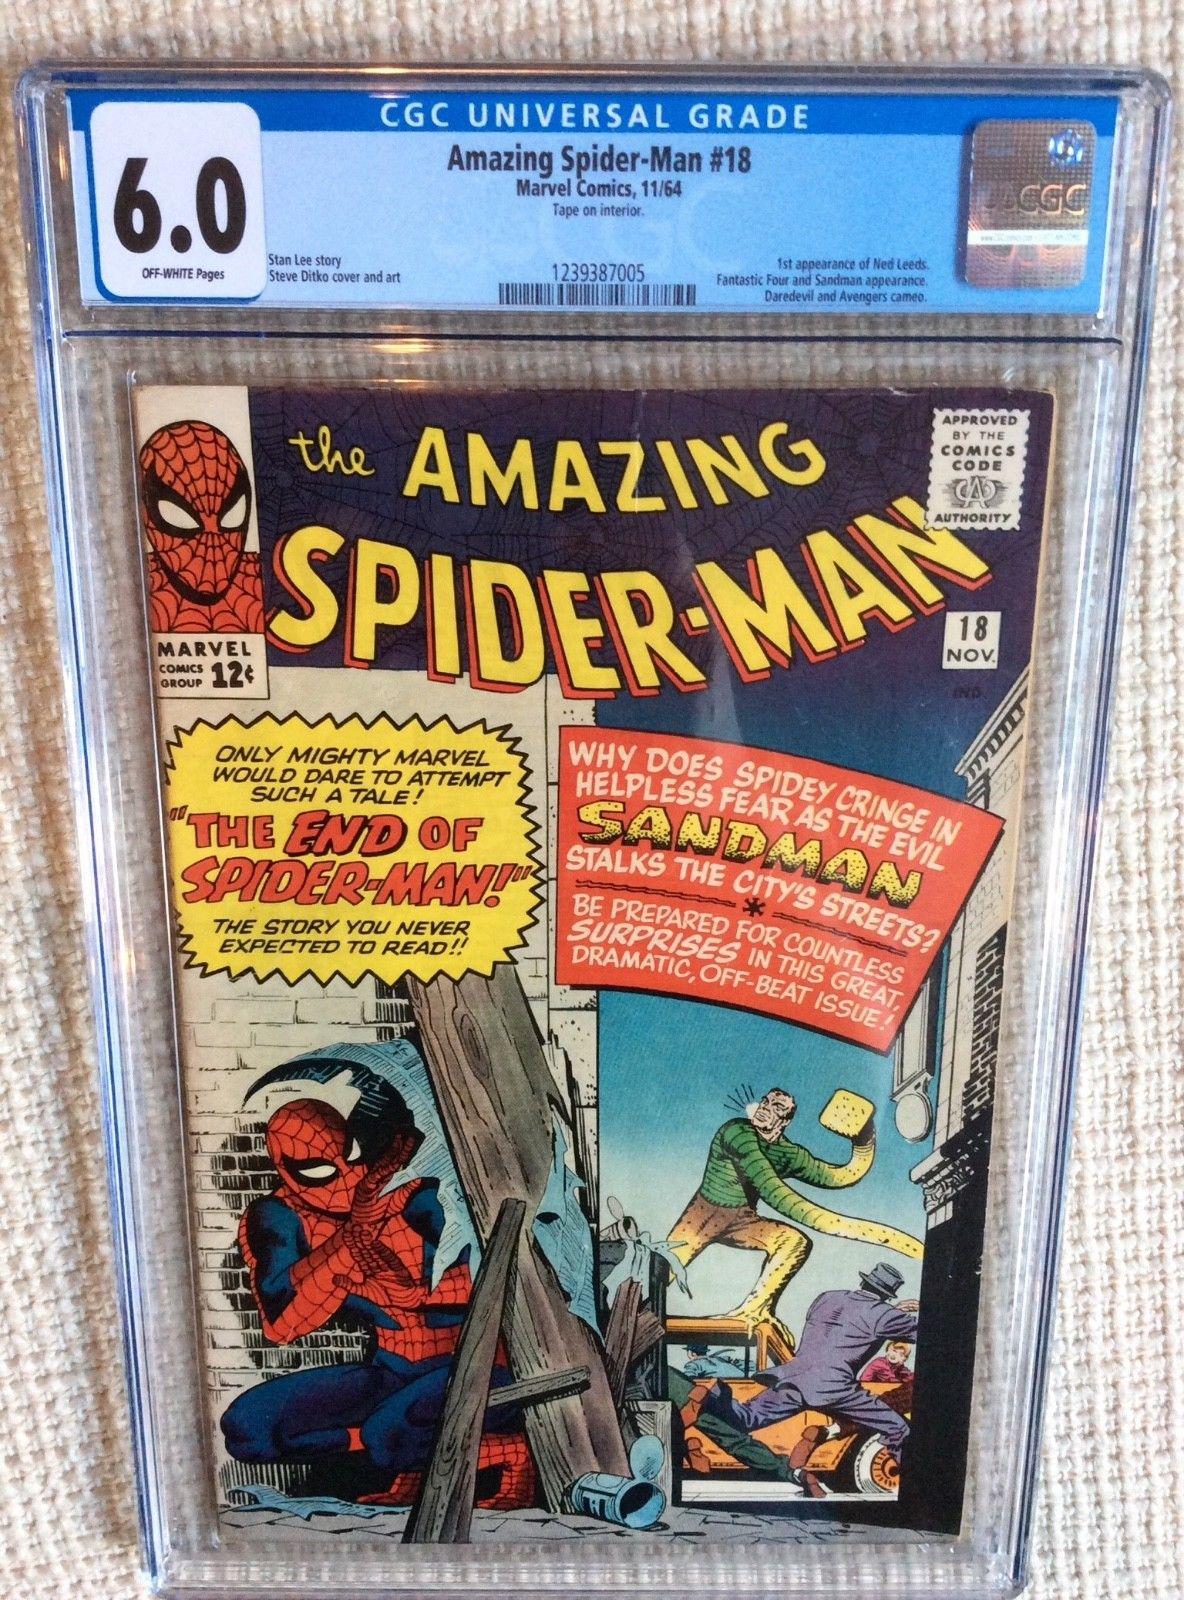 Amazing spider-man # 18 cgc 6.0 Stan Lee 1st Leeds, Avengers Fantastic four,14,4